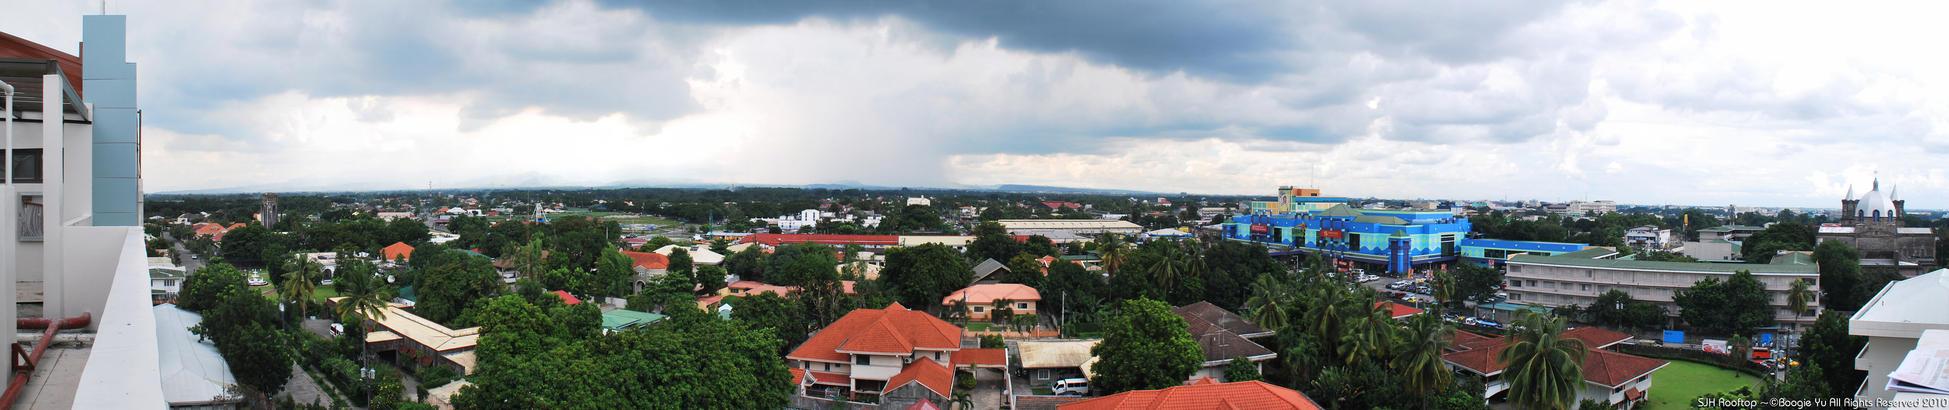 SJH Rooftop by bogskiii